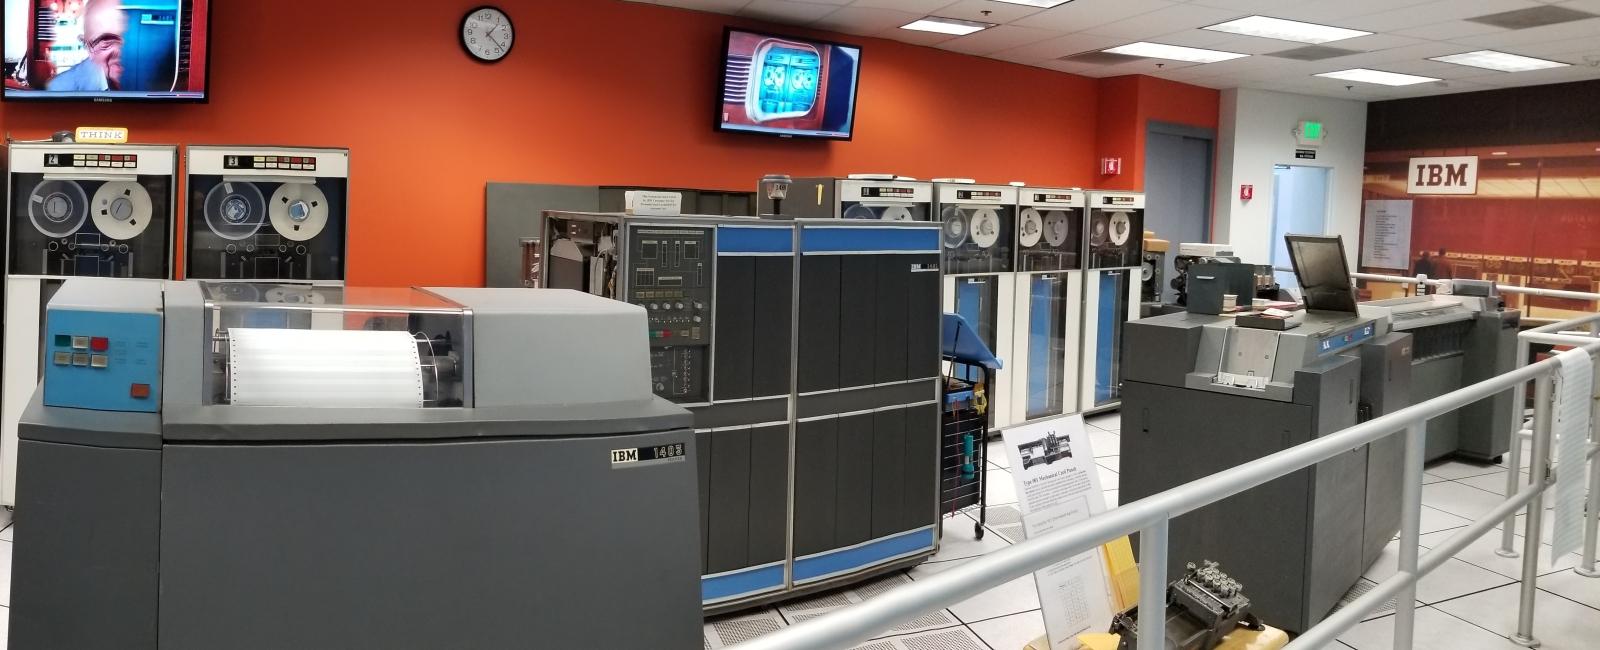 IBM 1403 Mainframe